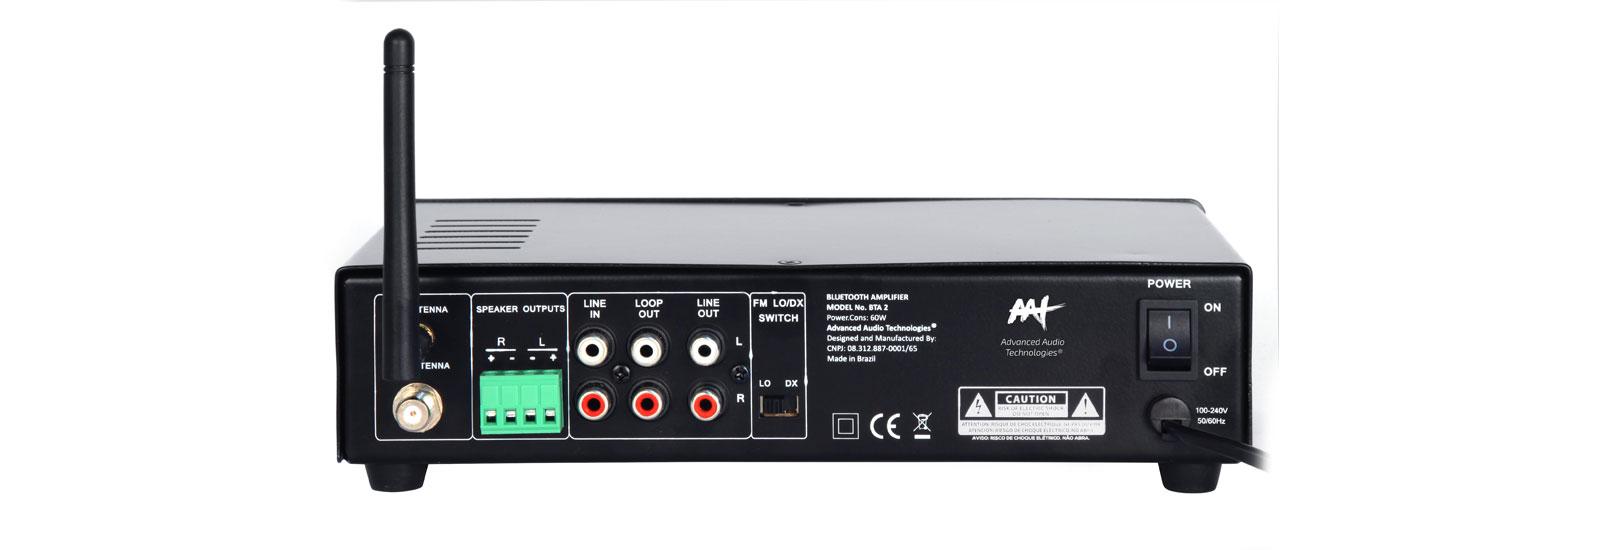 AAT BTA-2 - Receiver estéreo compacto com Bluetooth, Rádio FM, Entrada para  Pen-drive e entrada auxiliar.  - Audio Video & cia